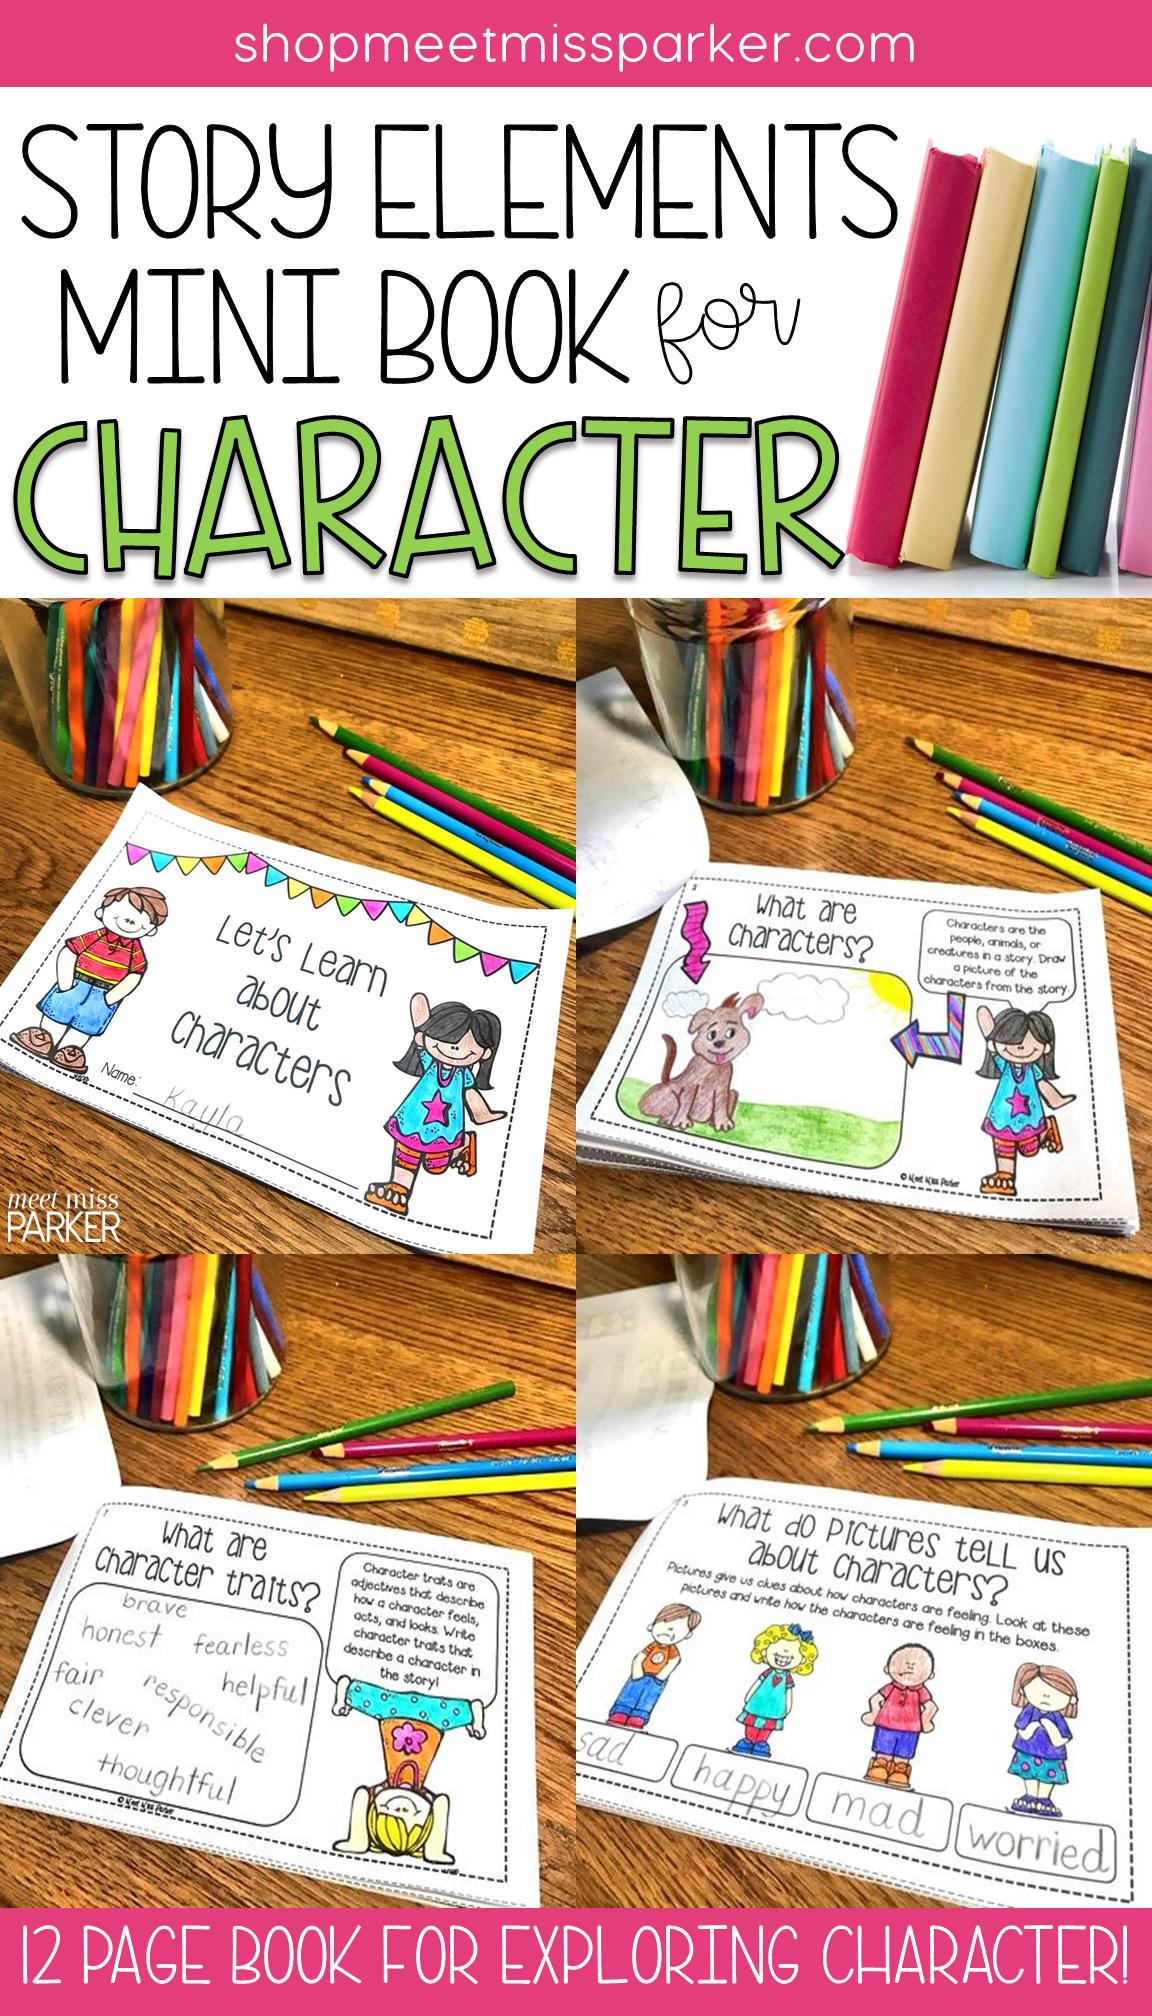 Story Elements Character Mini Book